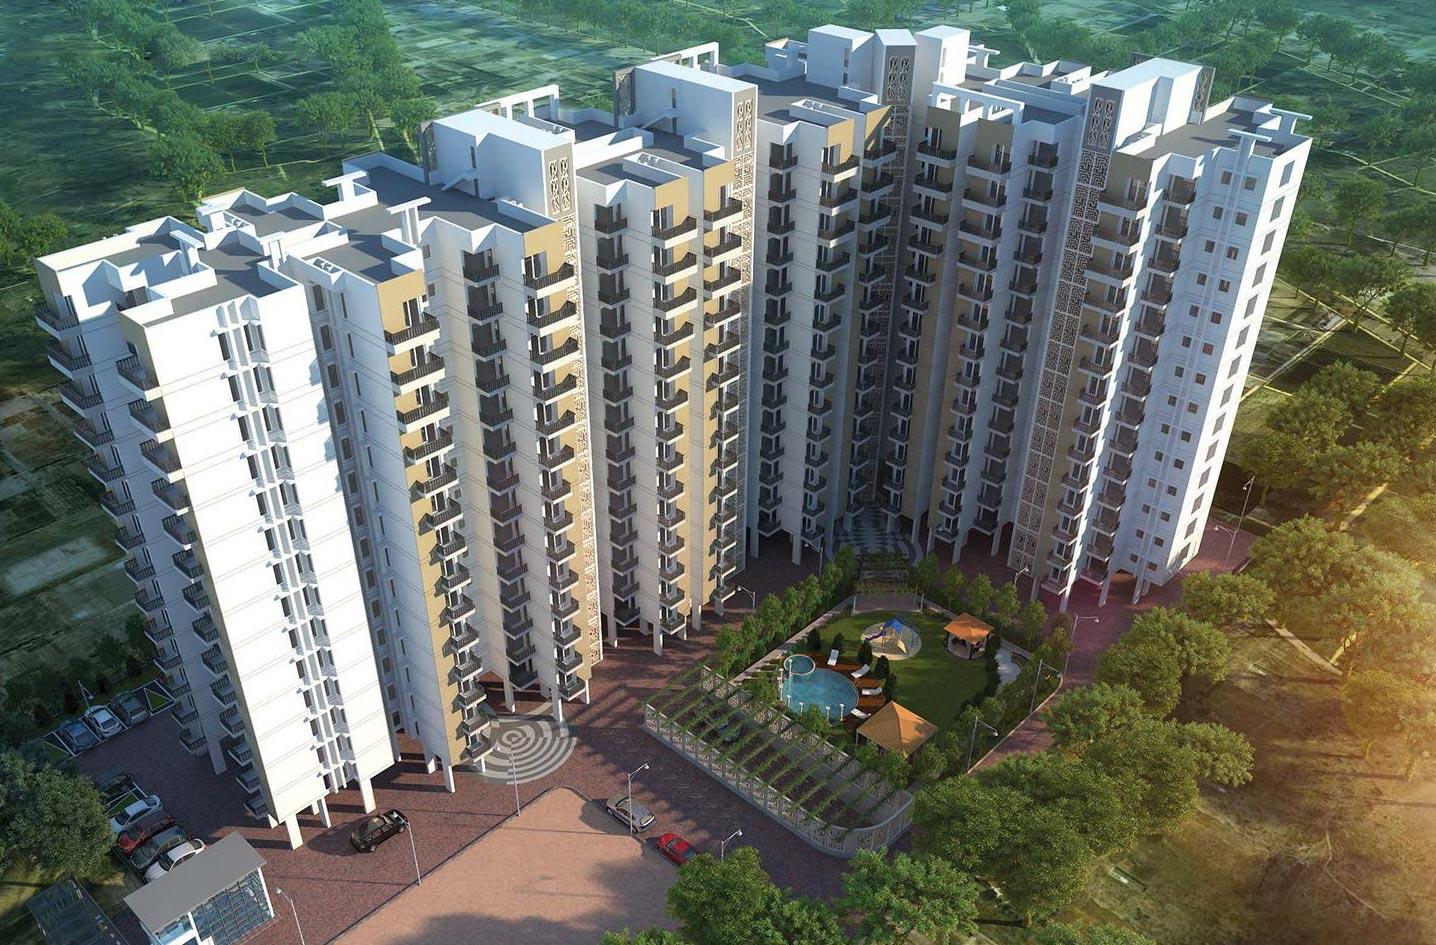 Cosmos Green Phase 2, Bhiwadi - 2 & 3 BHK Apartments